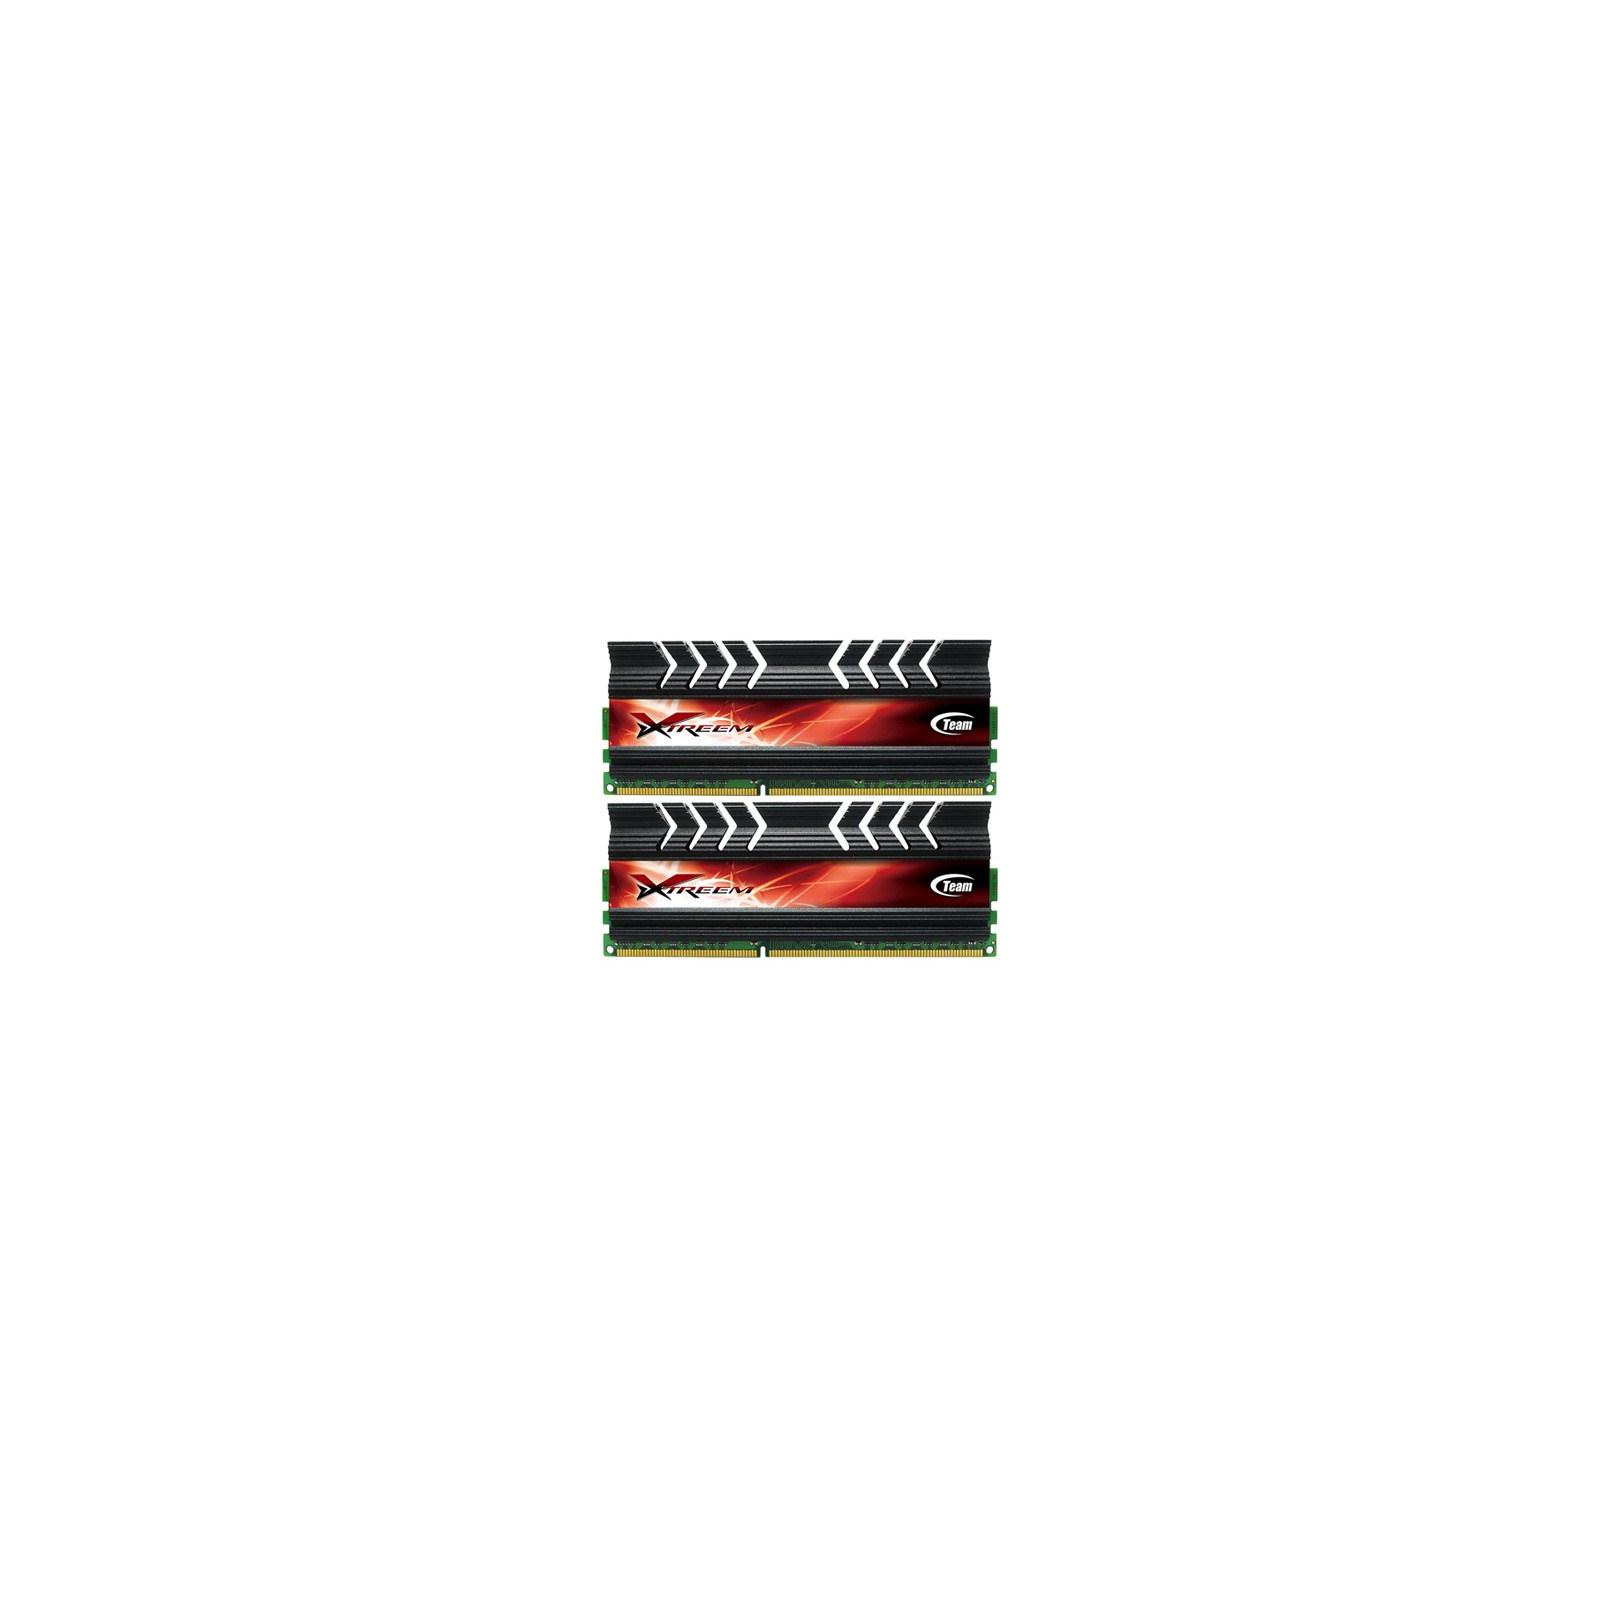 Модуль памяти для компьютера DDR3 8GB (2x4GB) 2133 MHz Team (TXD38G2133HC9NDC01)